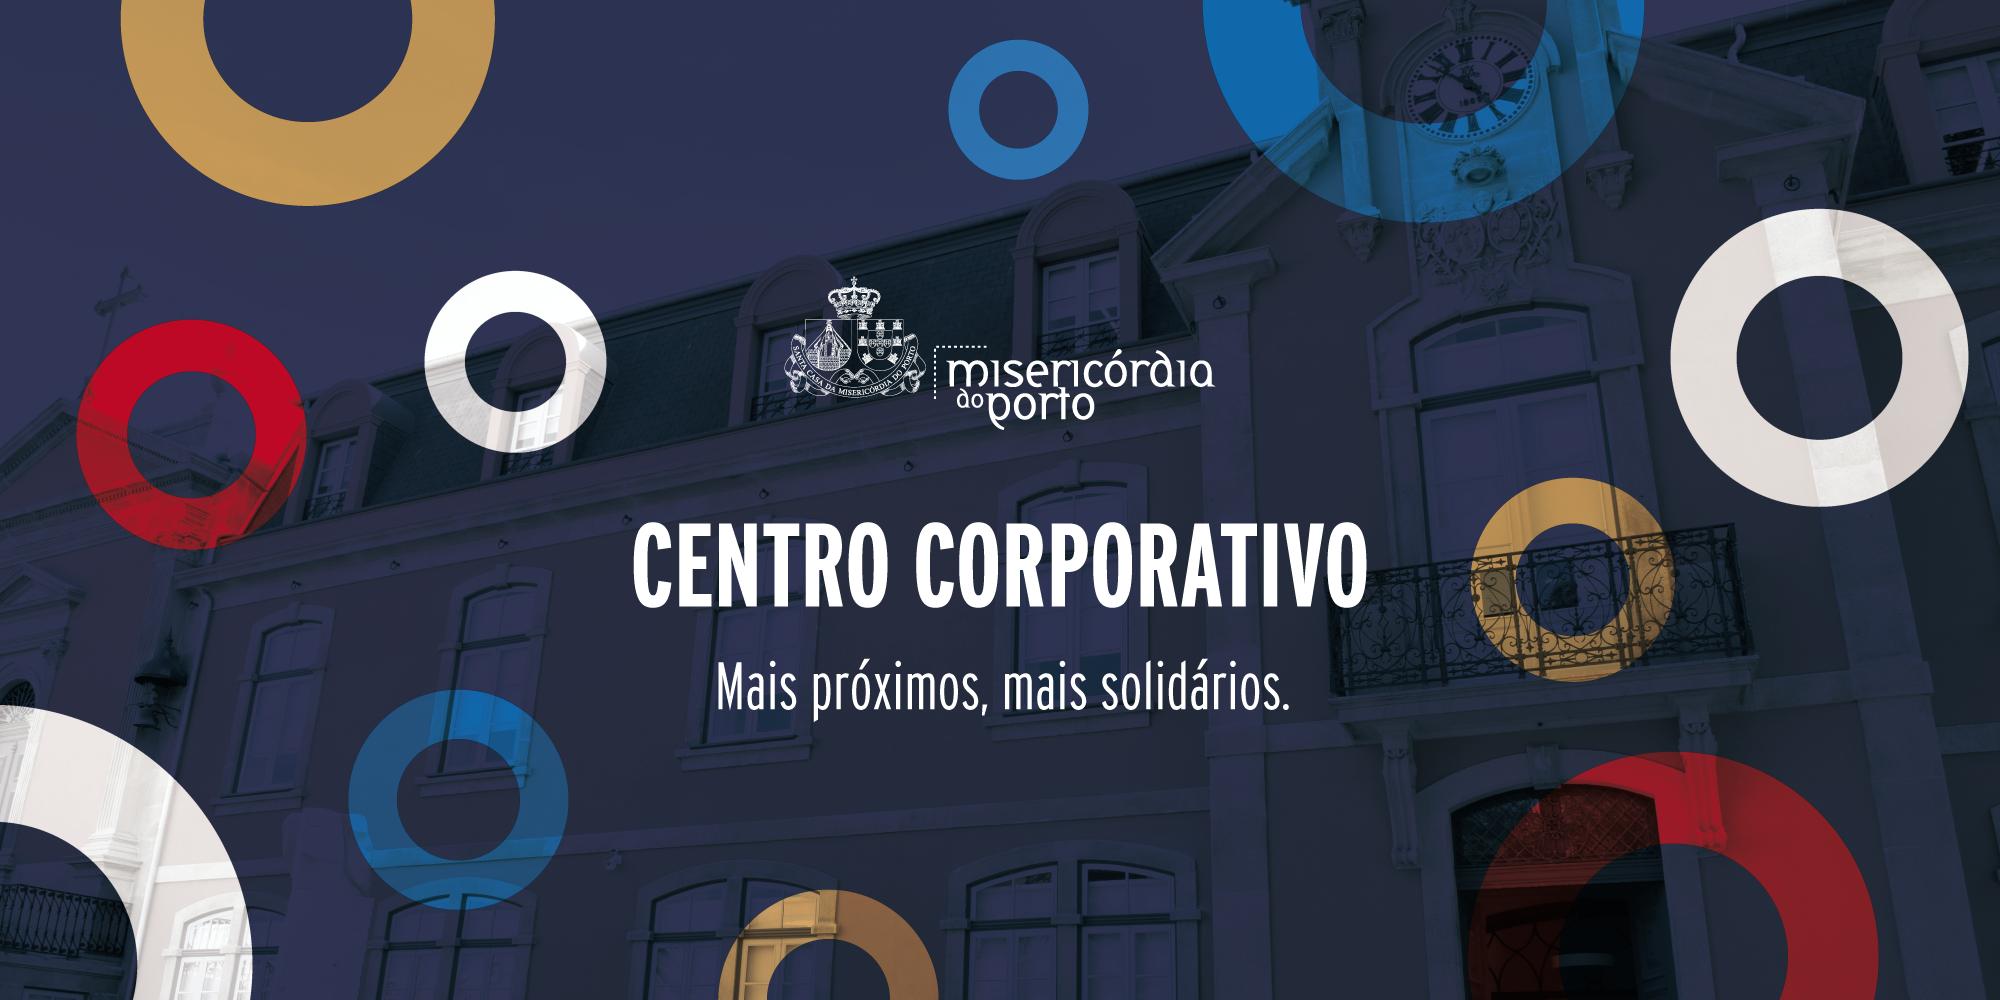 http://www.scmp.pt/assets/misc/img/Slideshow/SCMP-Separco-bannersite-v01.png